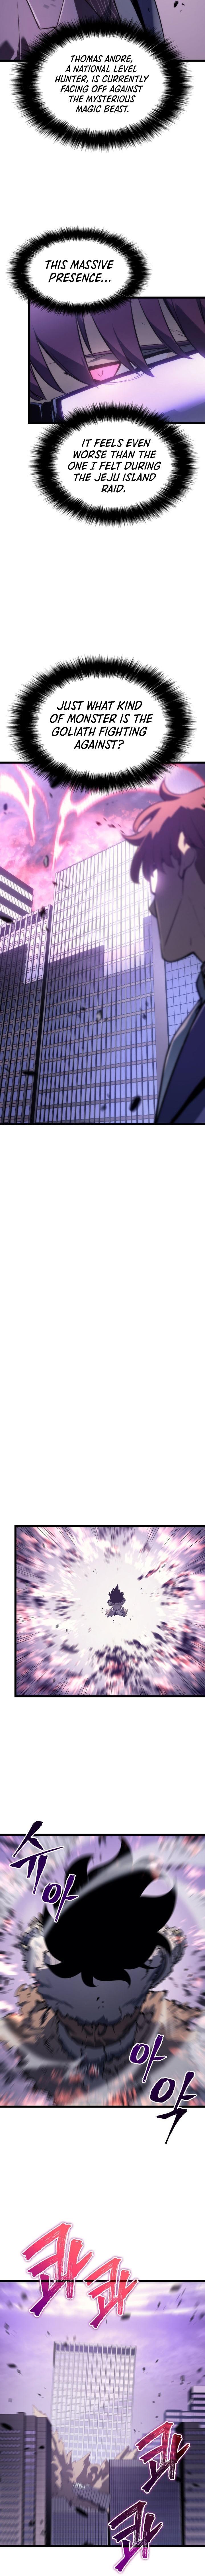 read solo leveling, solo leveling manga, solo leveling manhwa, solo leveling chapter, solo leveling light nowel, solo leveling 148, solo leveling chapter 148, solo leveling ch 147, solo leveling chapter 147, kakaopage solo leveling, solo leveling animation, solo leveling, solo leveling 103, solo leveling 102, solo leveling 115, solo leveling 114, solo leveling 109, solo leveling anime trailer, solo leveling anime news, solo leveling ashborn, solo leveling anime petition, solo leveling arcs, solo leveling anime season 1 release date, solo leveling art, solo leveling anime mappa, solo leveling artist, solo leveling anime studio, b rank healer solo leveling, solo leveling b rank, solo leveling b team, solo leveling beru, solo leveling bellion, solo leveling best panels, solo leveling baran, solo leveling box set, solo leveling beast monarch, solo leveling book amazon, solo leveling baek, solo leveling before and after, solo leveling baruka, d&c solo leveling, c rank solo leveling, solo leveling characters, solo leveling cha hae, solo leveling chapter release time, solo leveling chapter 149 release time, solo leveling christopher reed, solo leveling chapter 149, solo leveling comic, solo leveling chapter 150 release time, solo leveling chapter 146, solo leveling dnd, d&c webtoon twitter solo leveling, solo leveling d rank, fond d'écran solo leveling, fond d'écran solo leveling 1920x1080, solo leveling dragon, solo leveling demon girl, solo leveling dad, solo leveling dragon monarch, solo leveling daily workout, solo leveling double dungeon, solo leveling drawing, solo leveling dong su, solo leveling daily quest, solo leveling demon king baran, e rank solo leveling, monarcas e governantes solo leveling, solo leveling rank, solo leveling national rank, solo leveling shadow rank